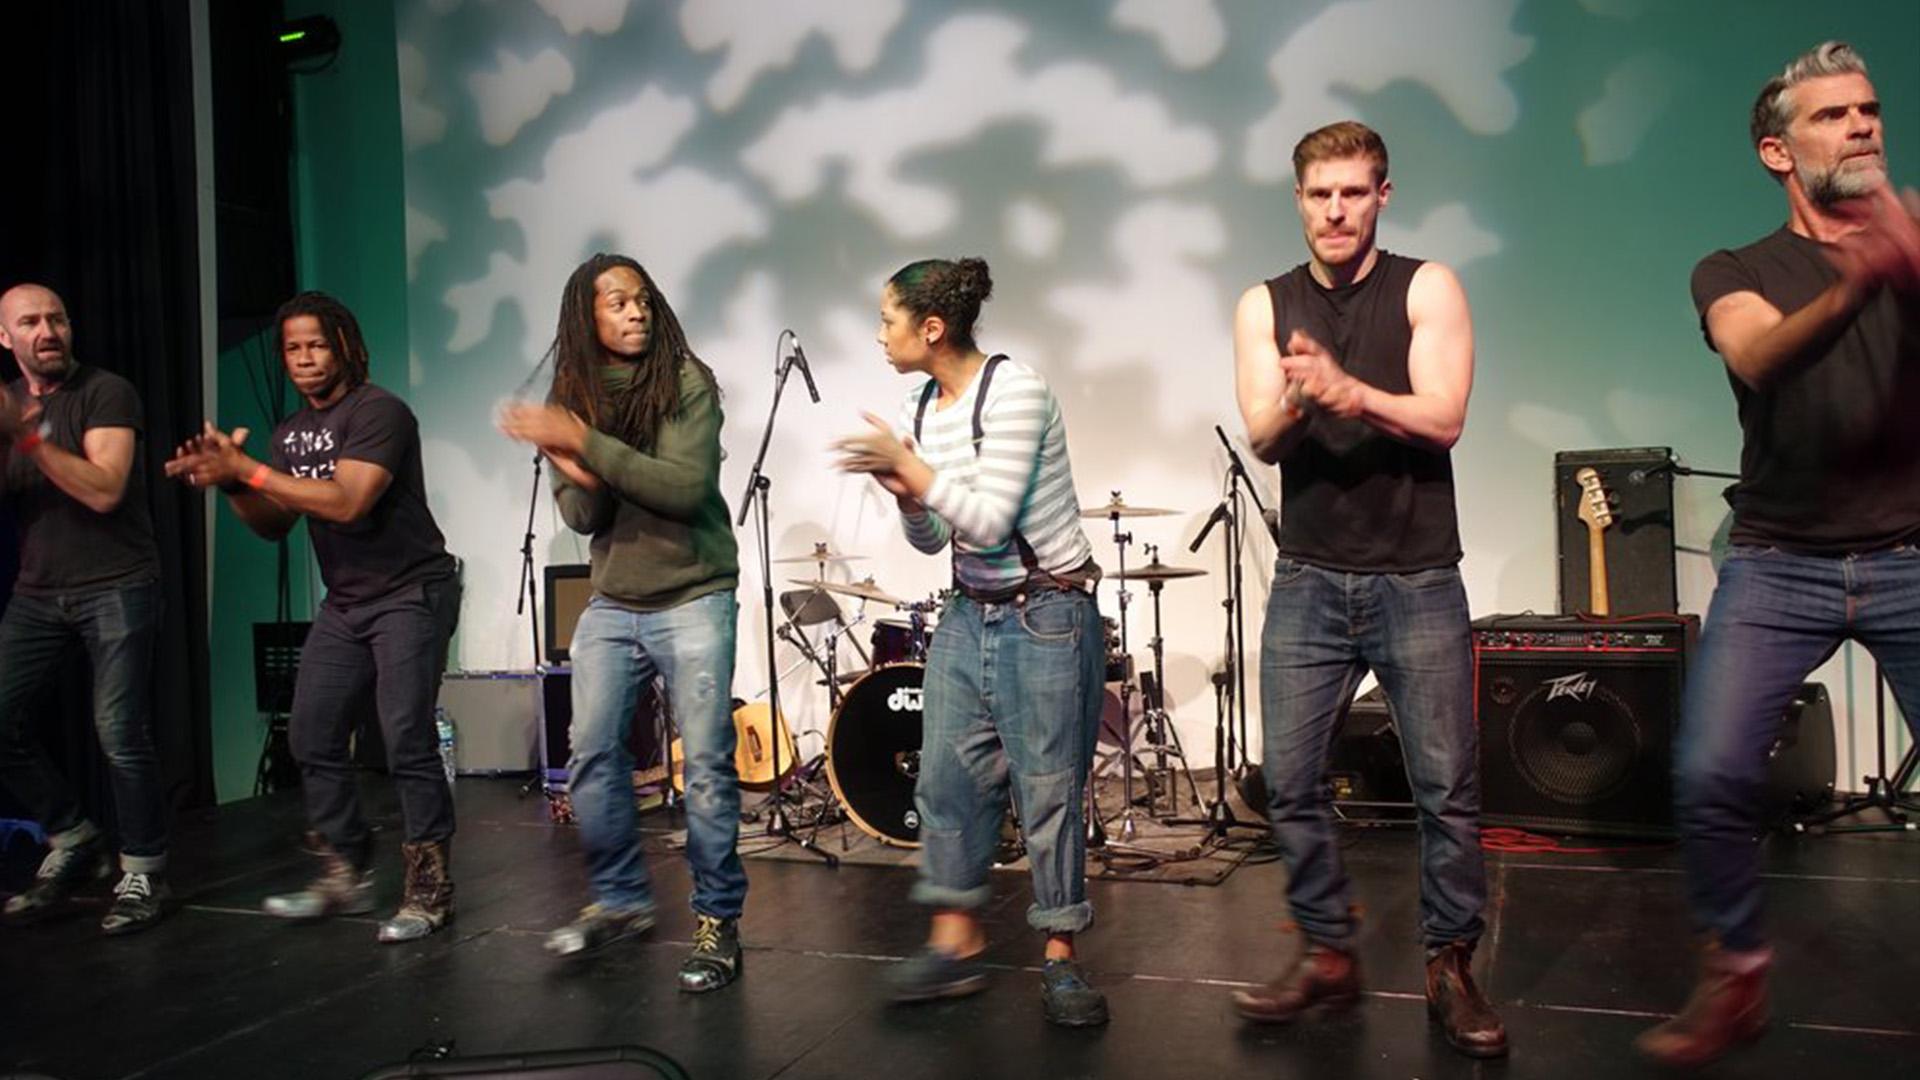 STOMP reheasing at Anno's Africa charity fundraiser. Paul Gunter, Hugo Cortes, Nigel Clarke, Serena Morgan, Rob Shaw, Fraser Morrison.